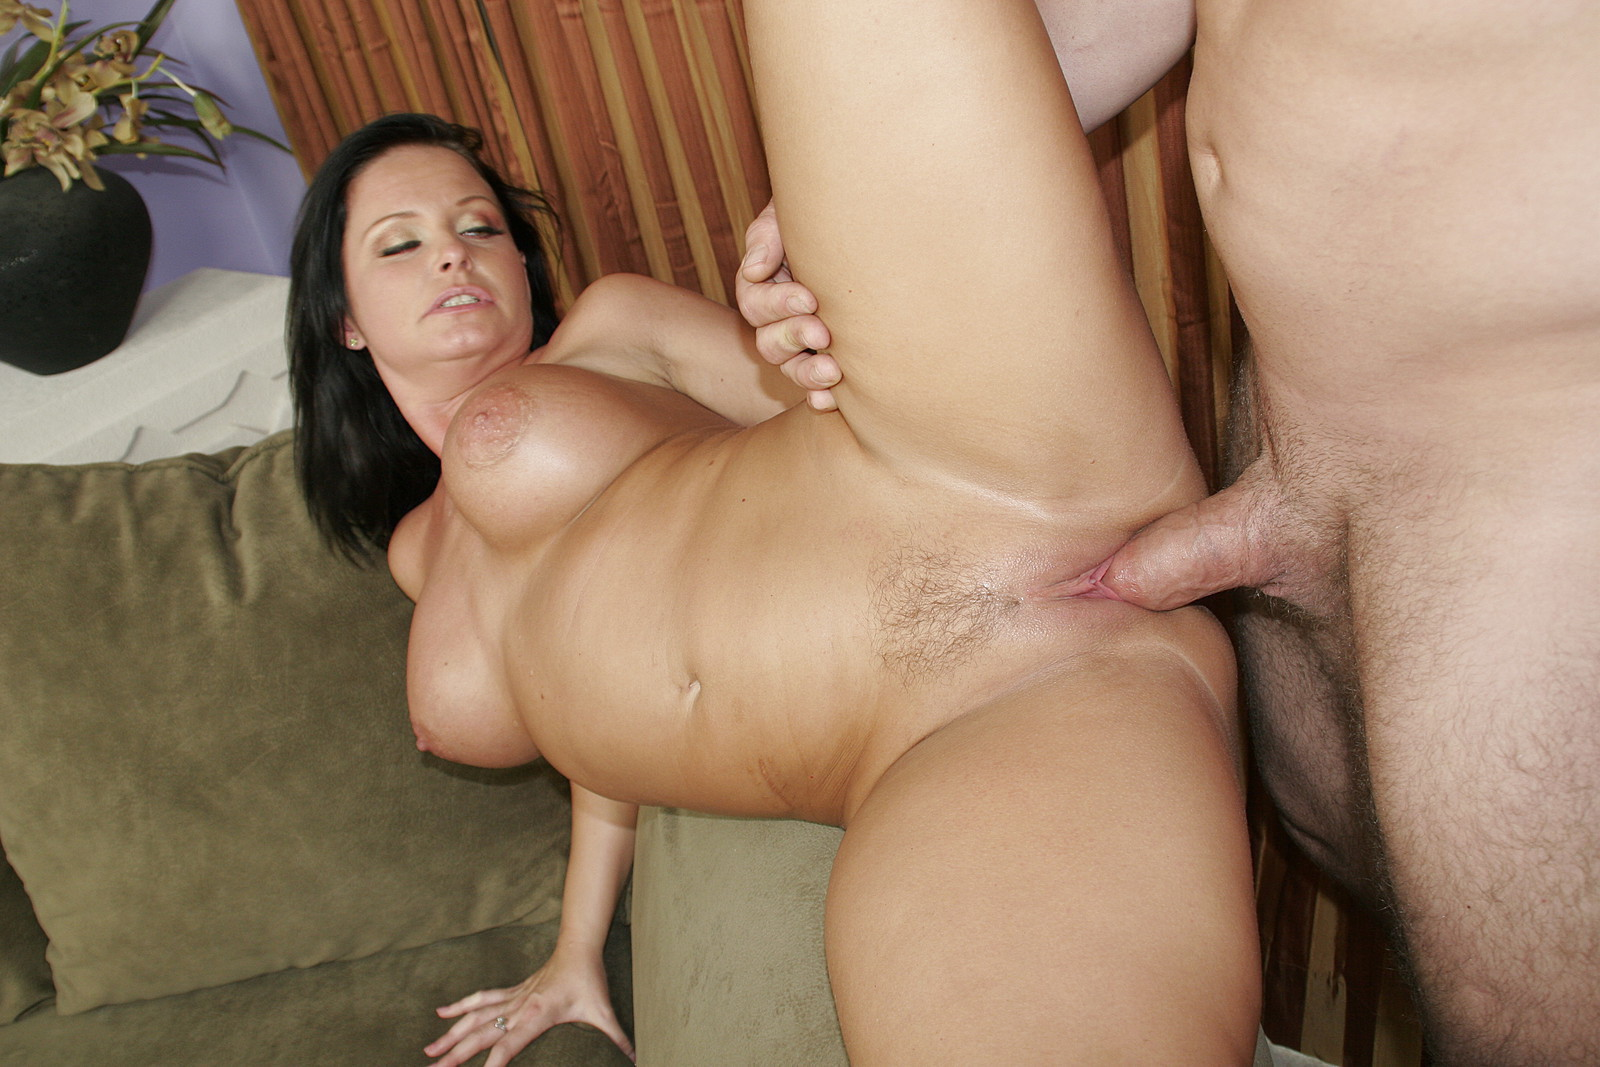 Gorgeous women nude playboy